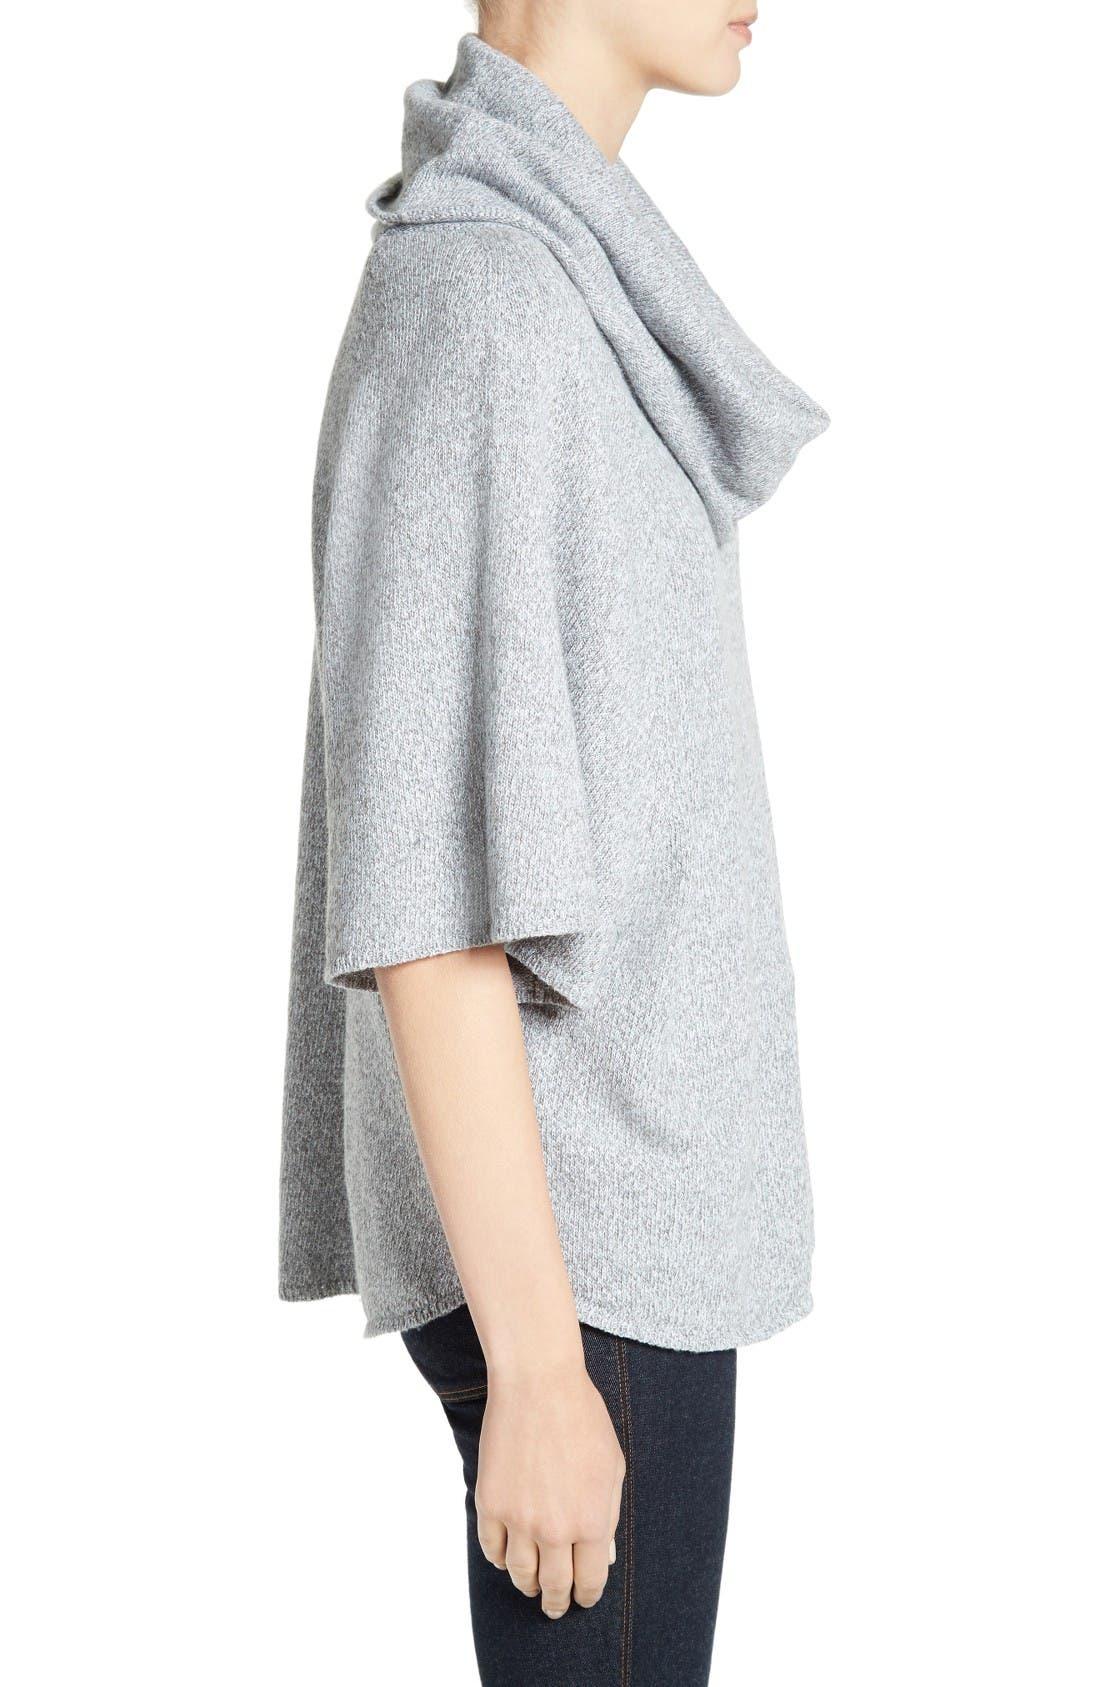 Celia Cowl Neck Sweater,                             Alternate thumbnail 3, color,                             Light Smoke Multi